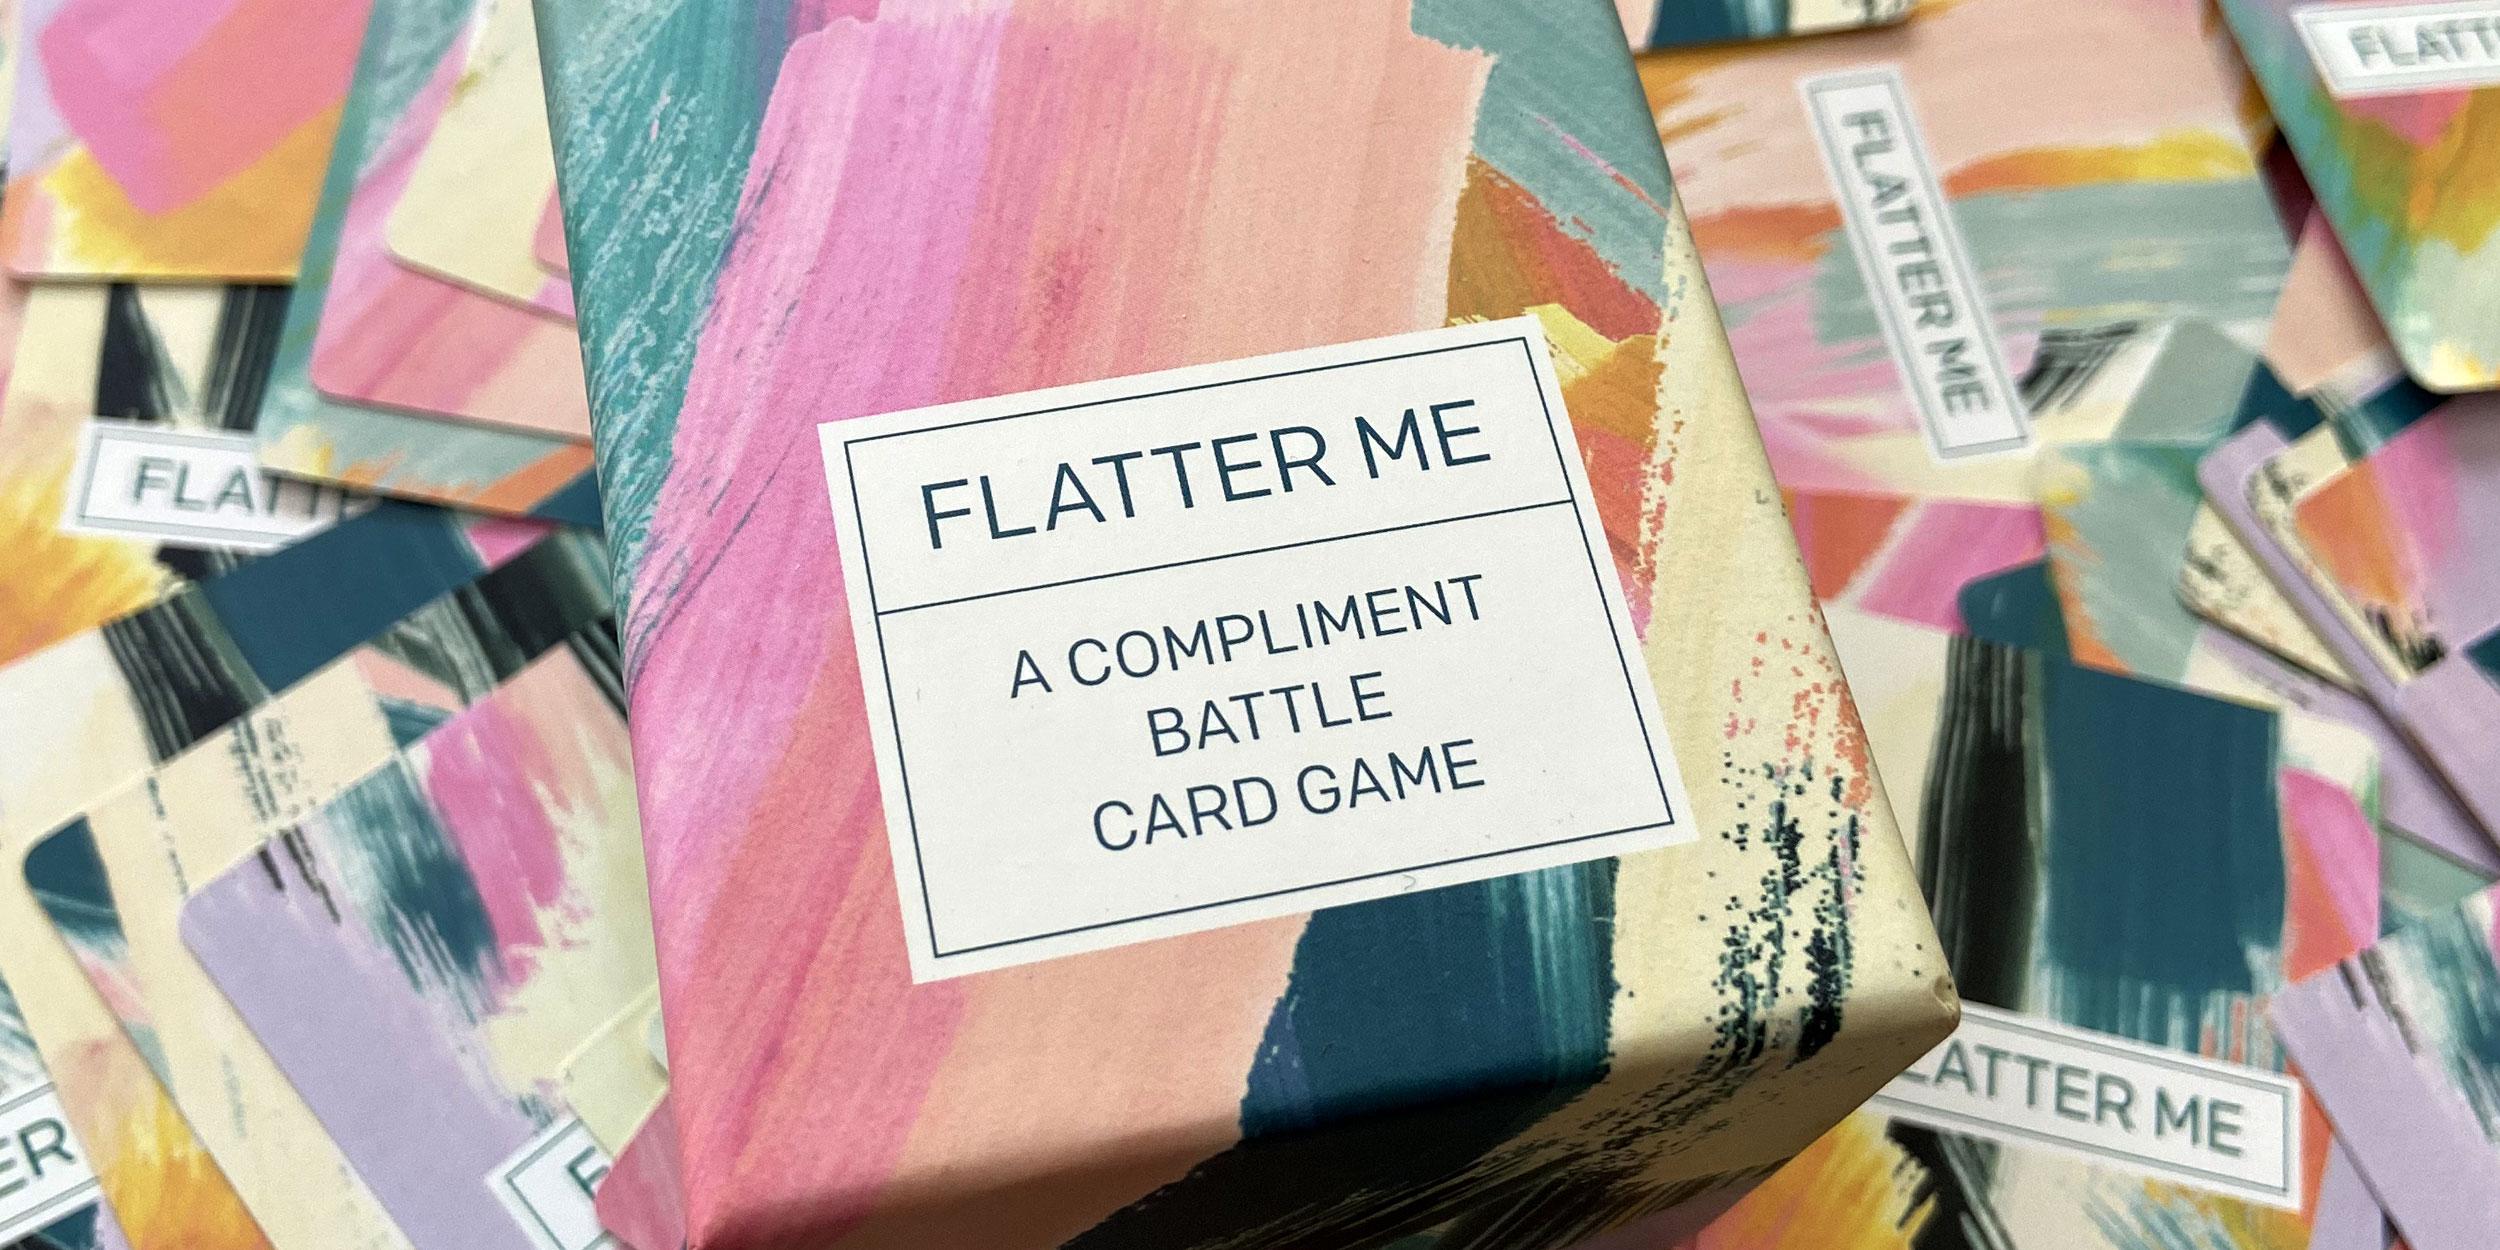 Flatter Me - A Compliment Battle Card Game